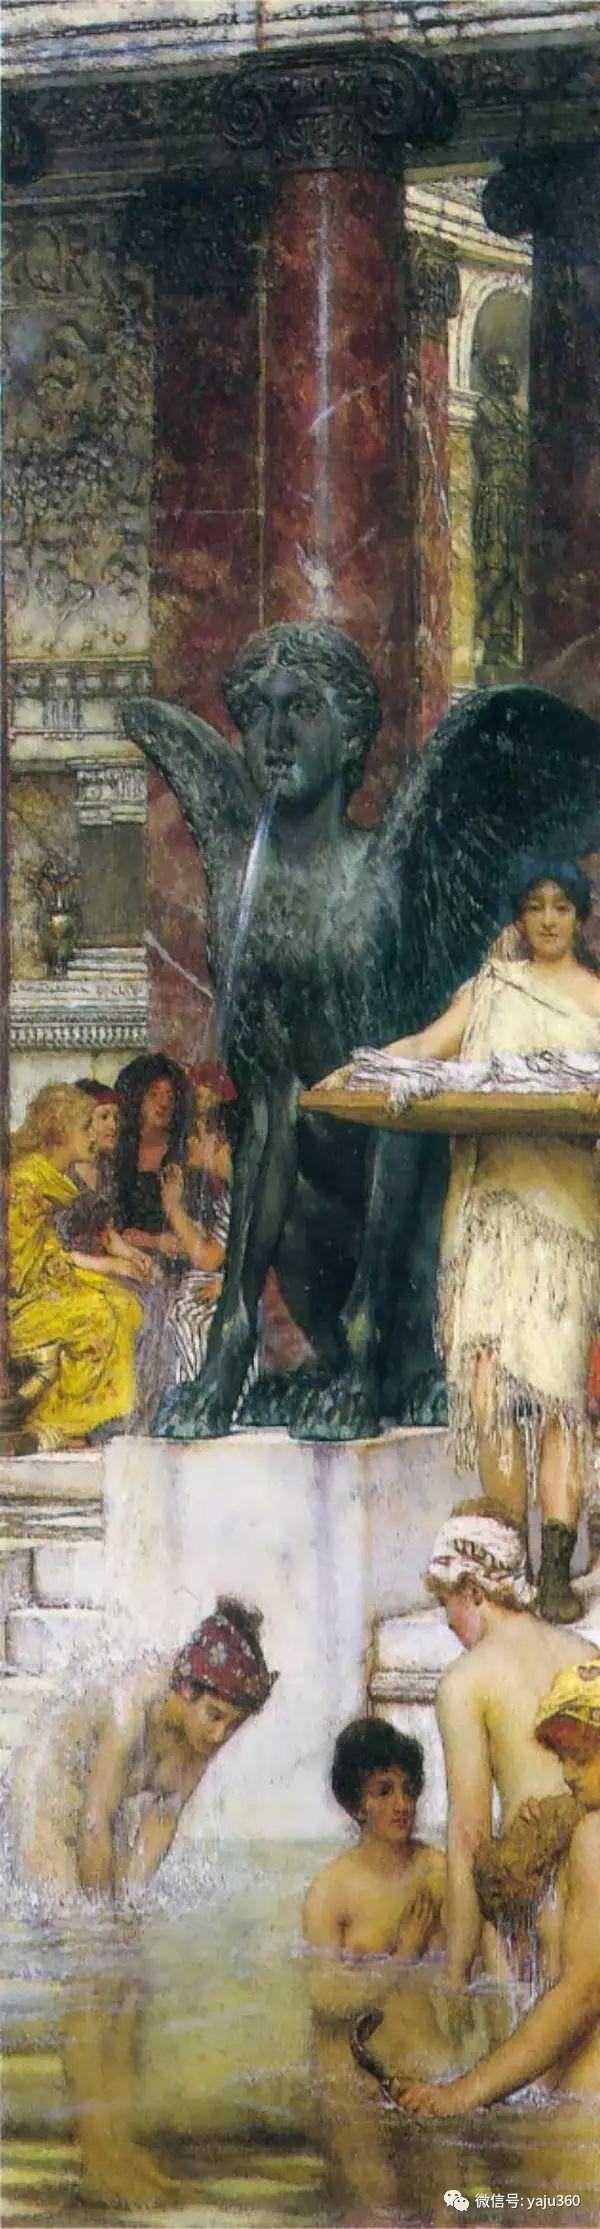 英国画家Lawrence Alma Tadema油画作品插图93